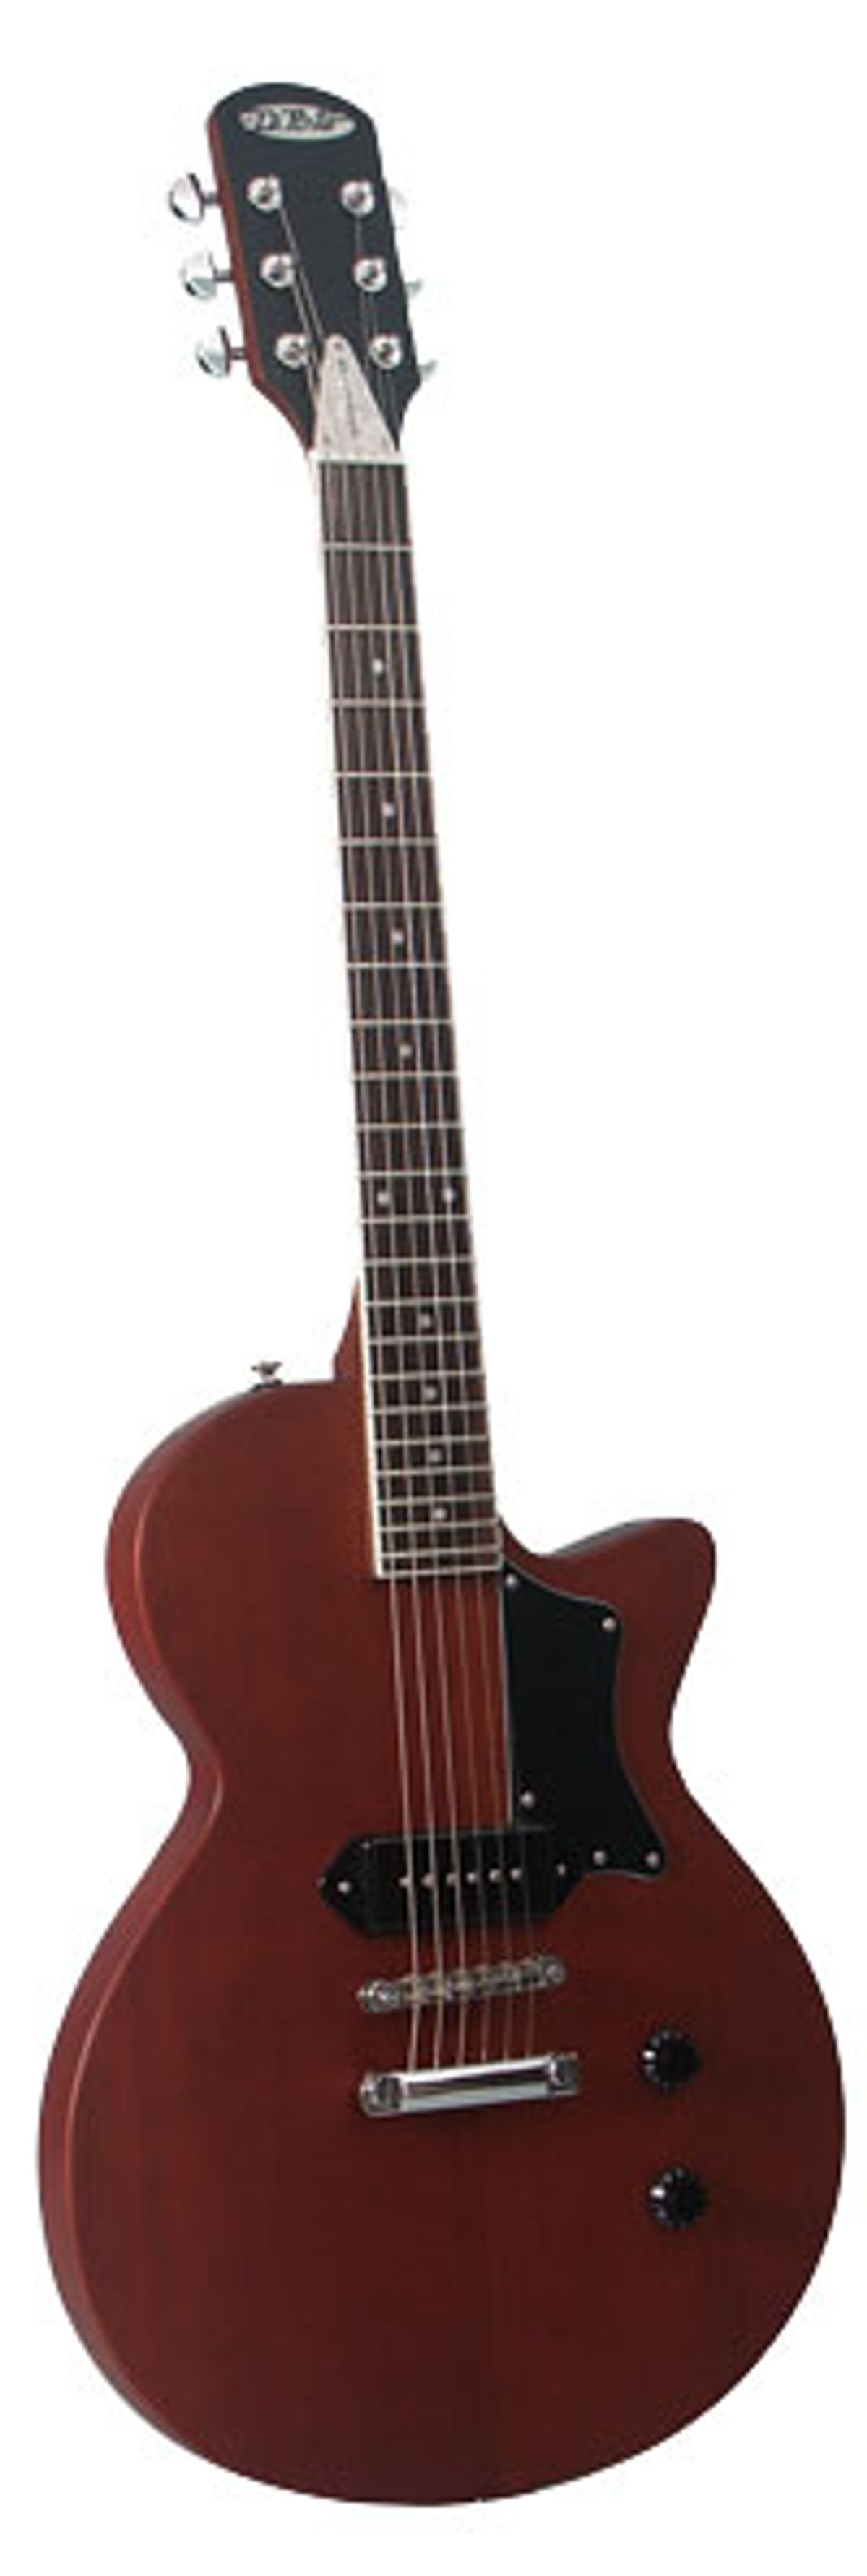 DiPinto Guitars Announces Belvedere Jr.